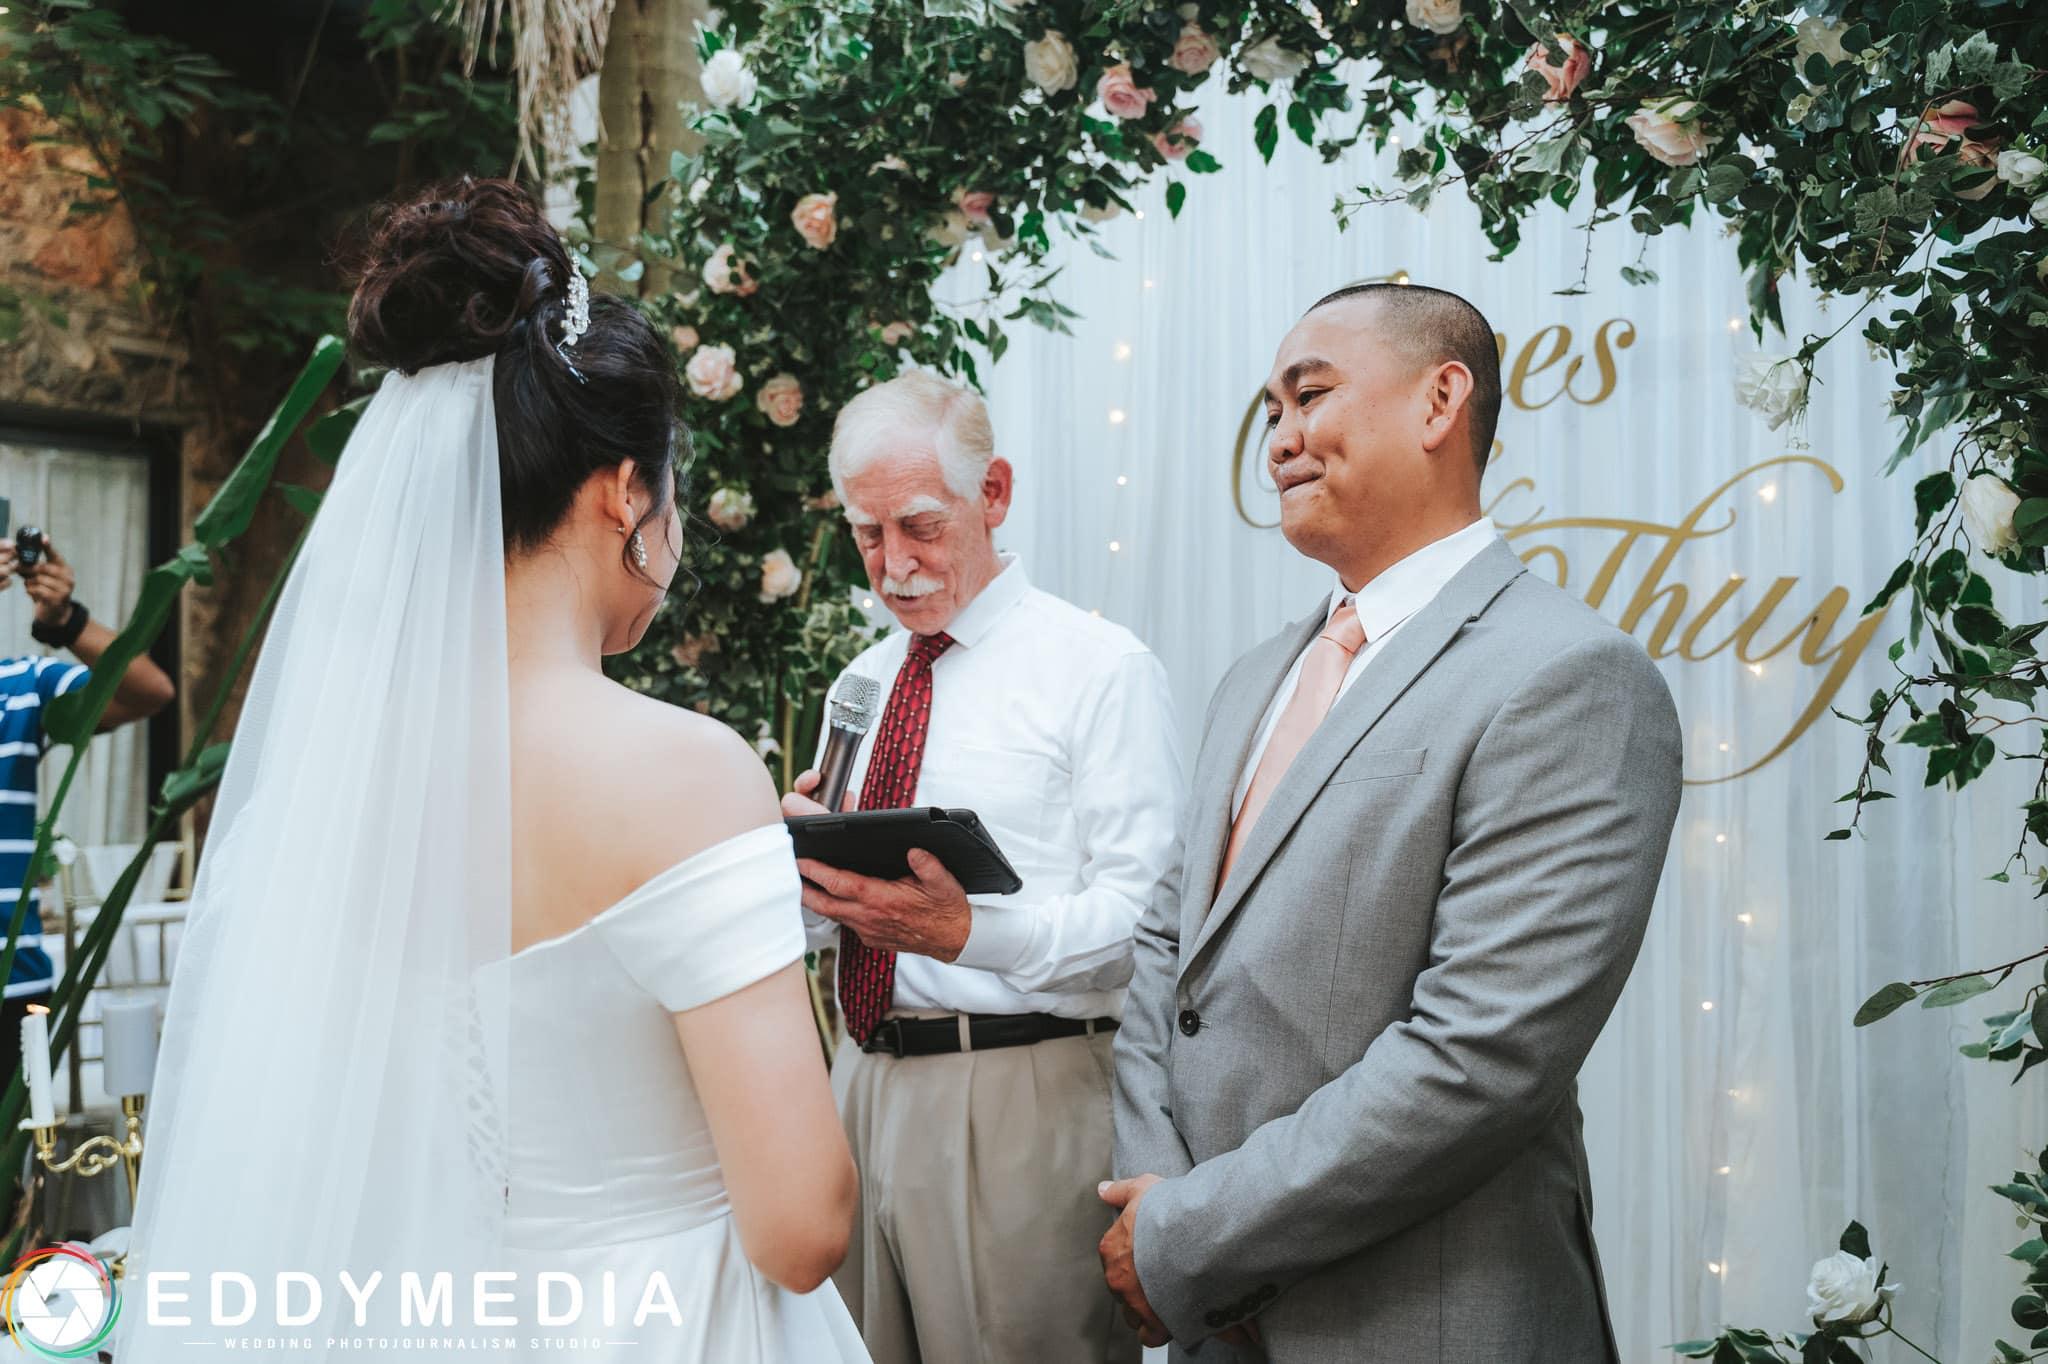 Phongsucuoi James KieuThuy EddyMedia 28 tiệc cưới ngoài trời